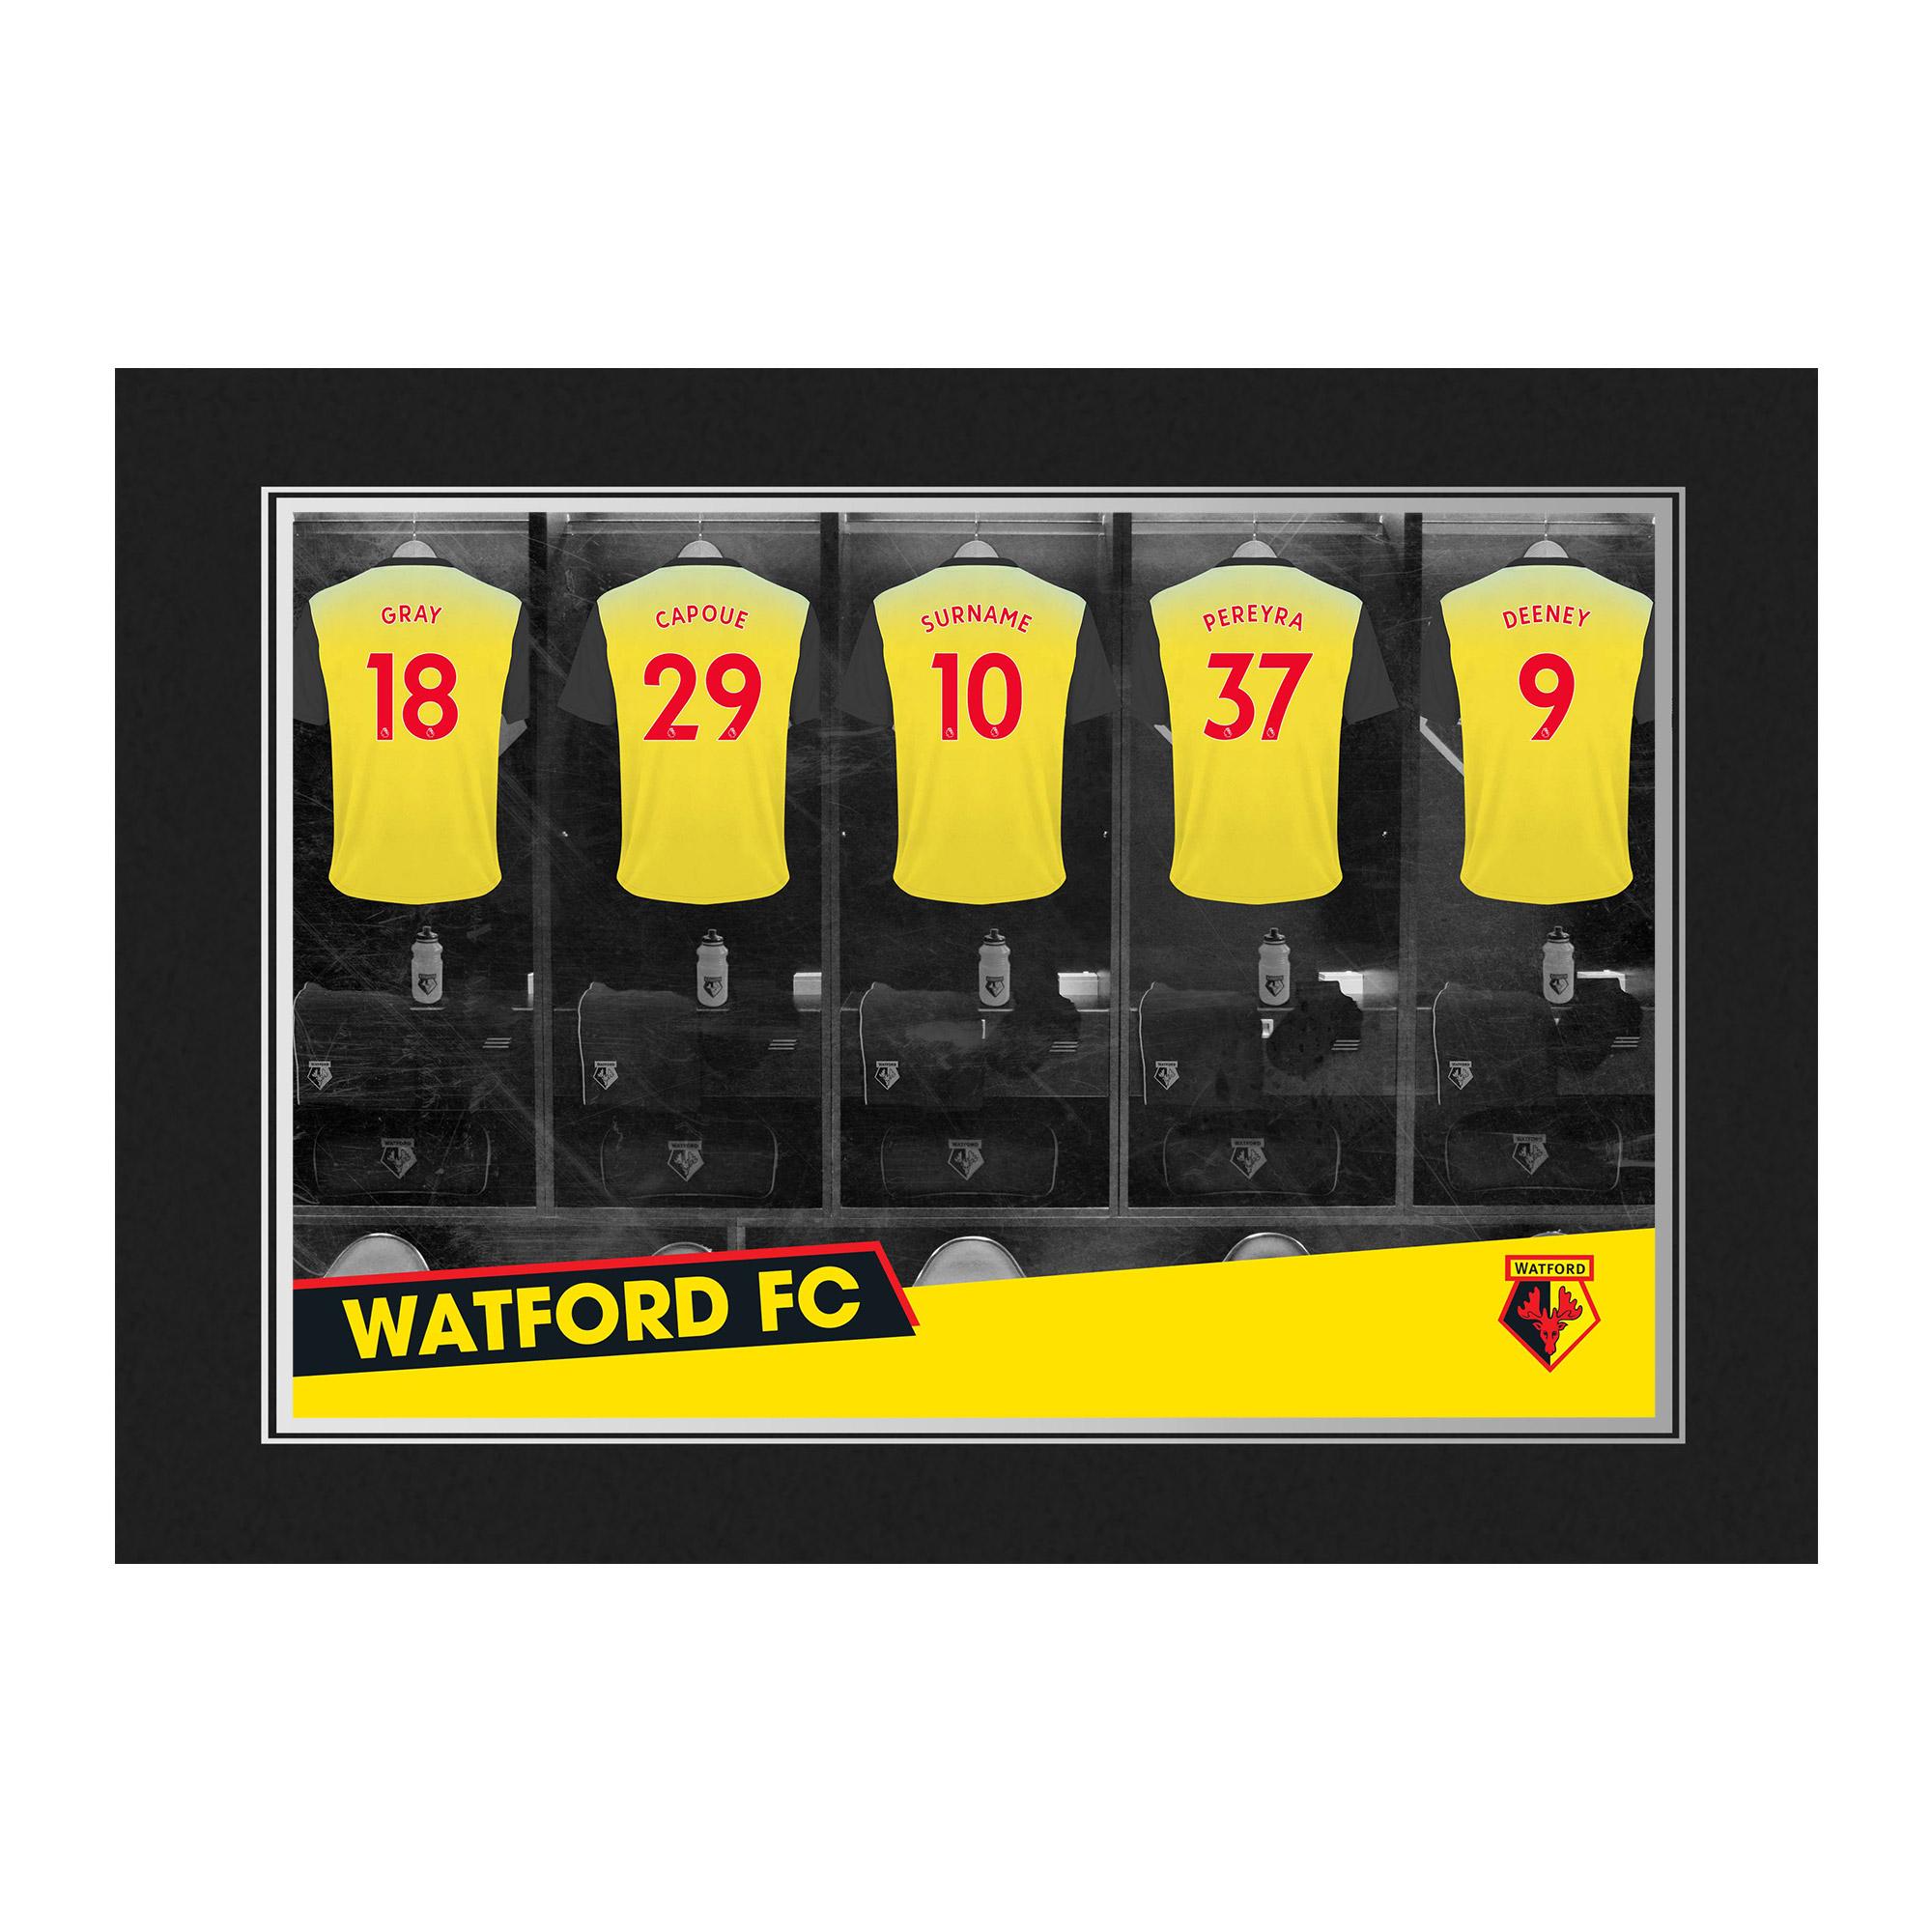 Watford FC 9x6 Dressing Room Photo